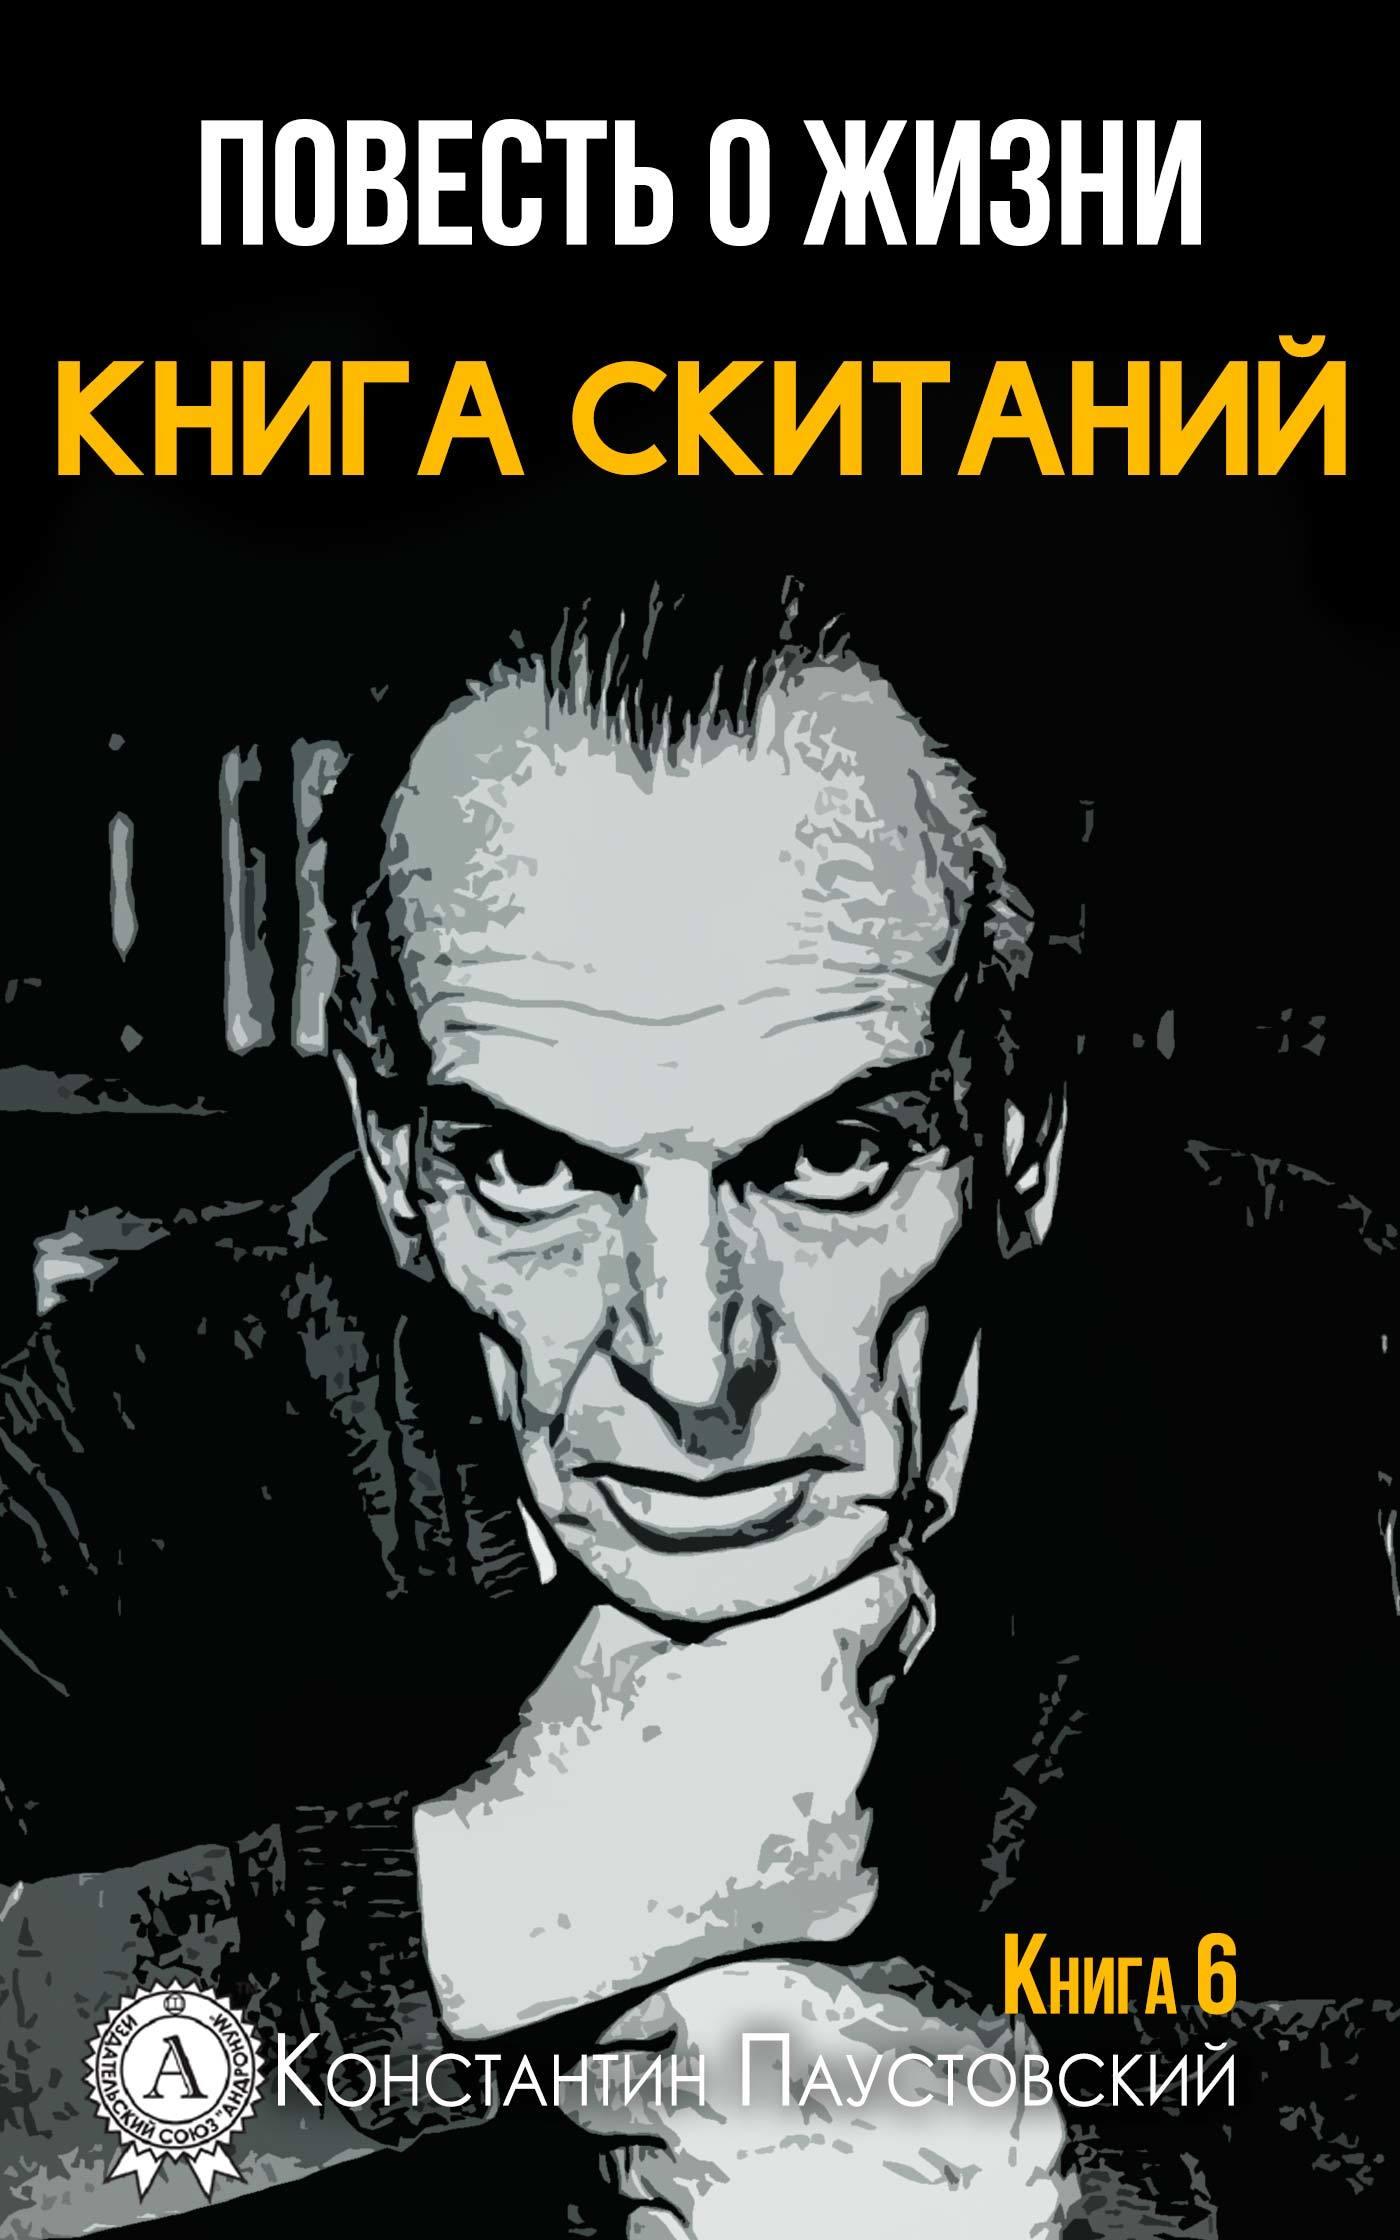 Константин Паустовский Книга скитаний